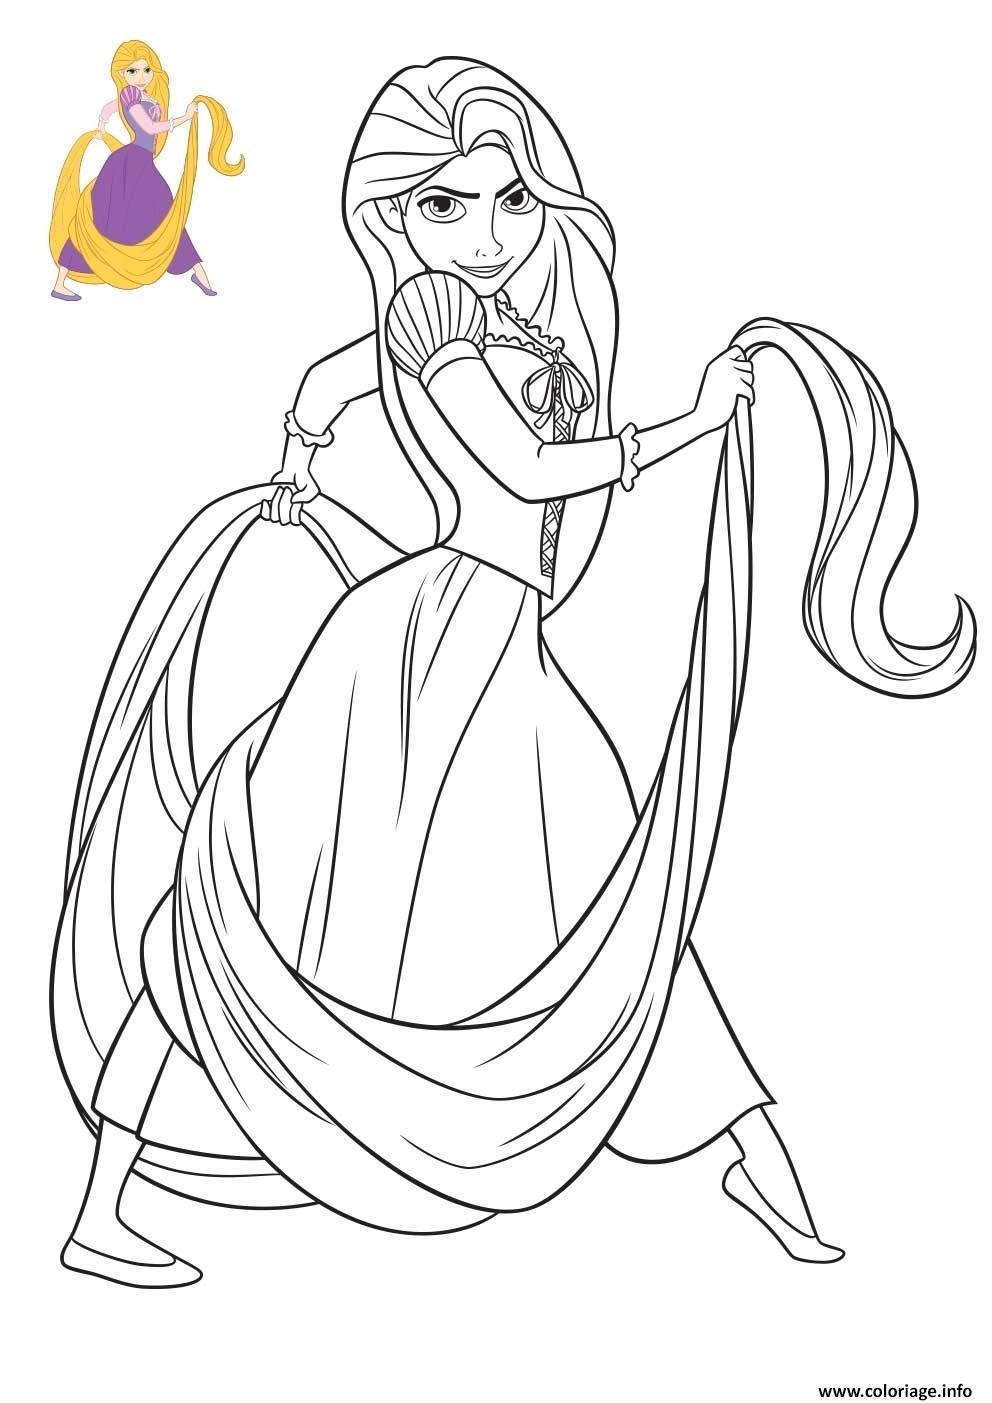 Coloriage Princesse Disney Raiponce Dessin Princesse ...